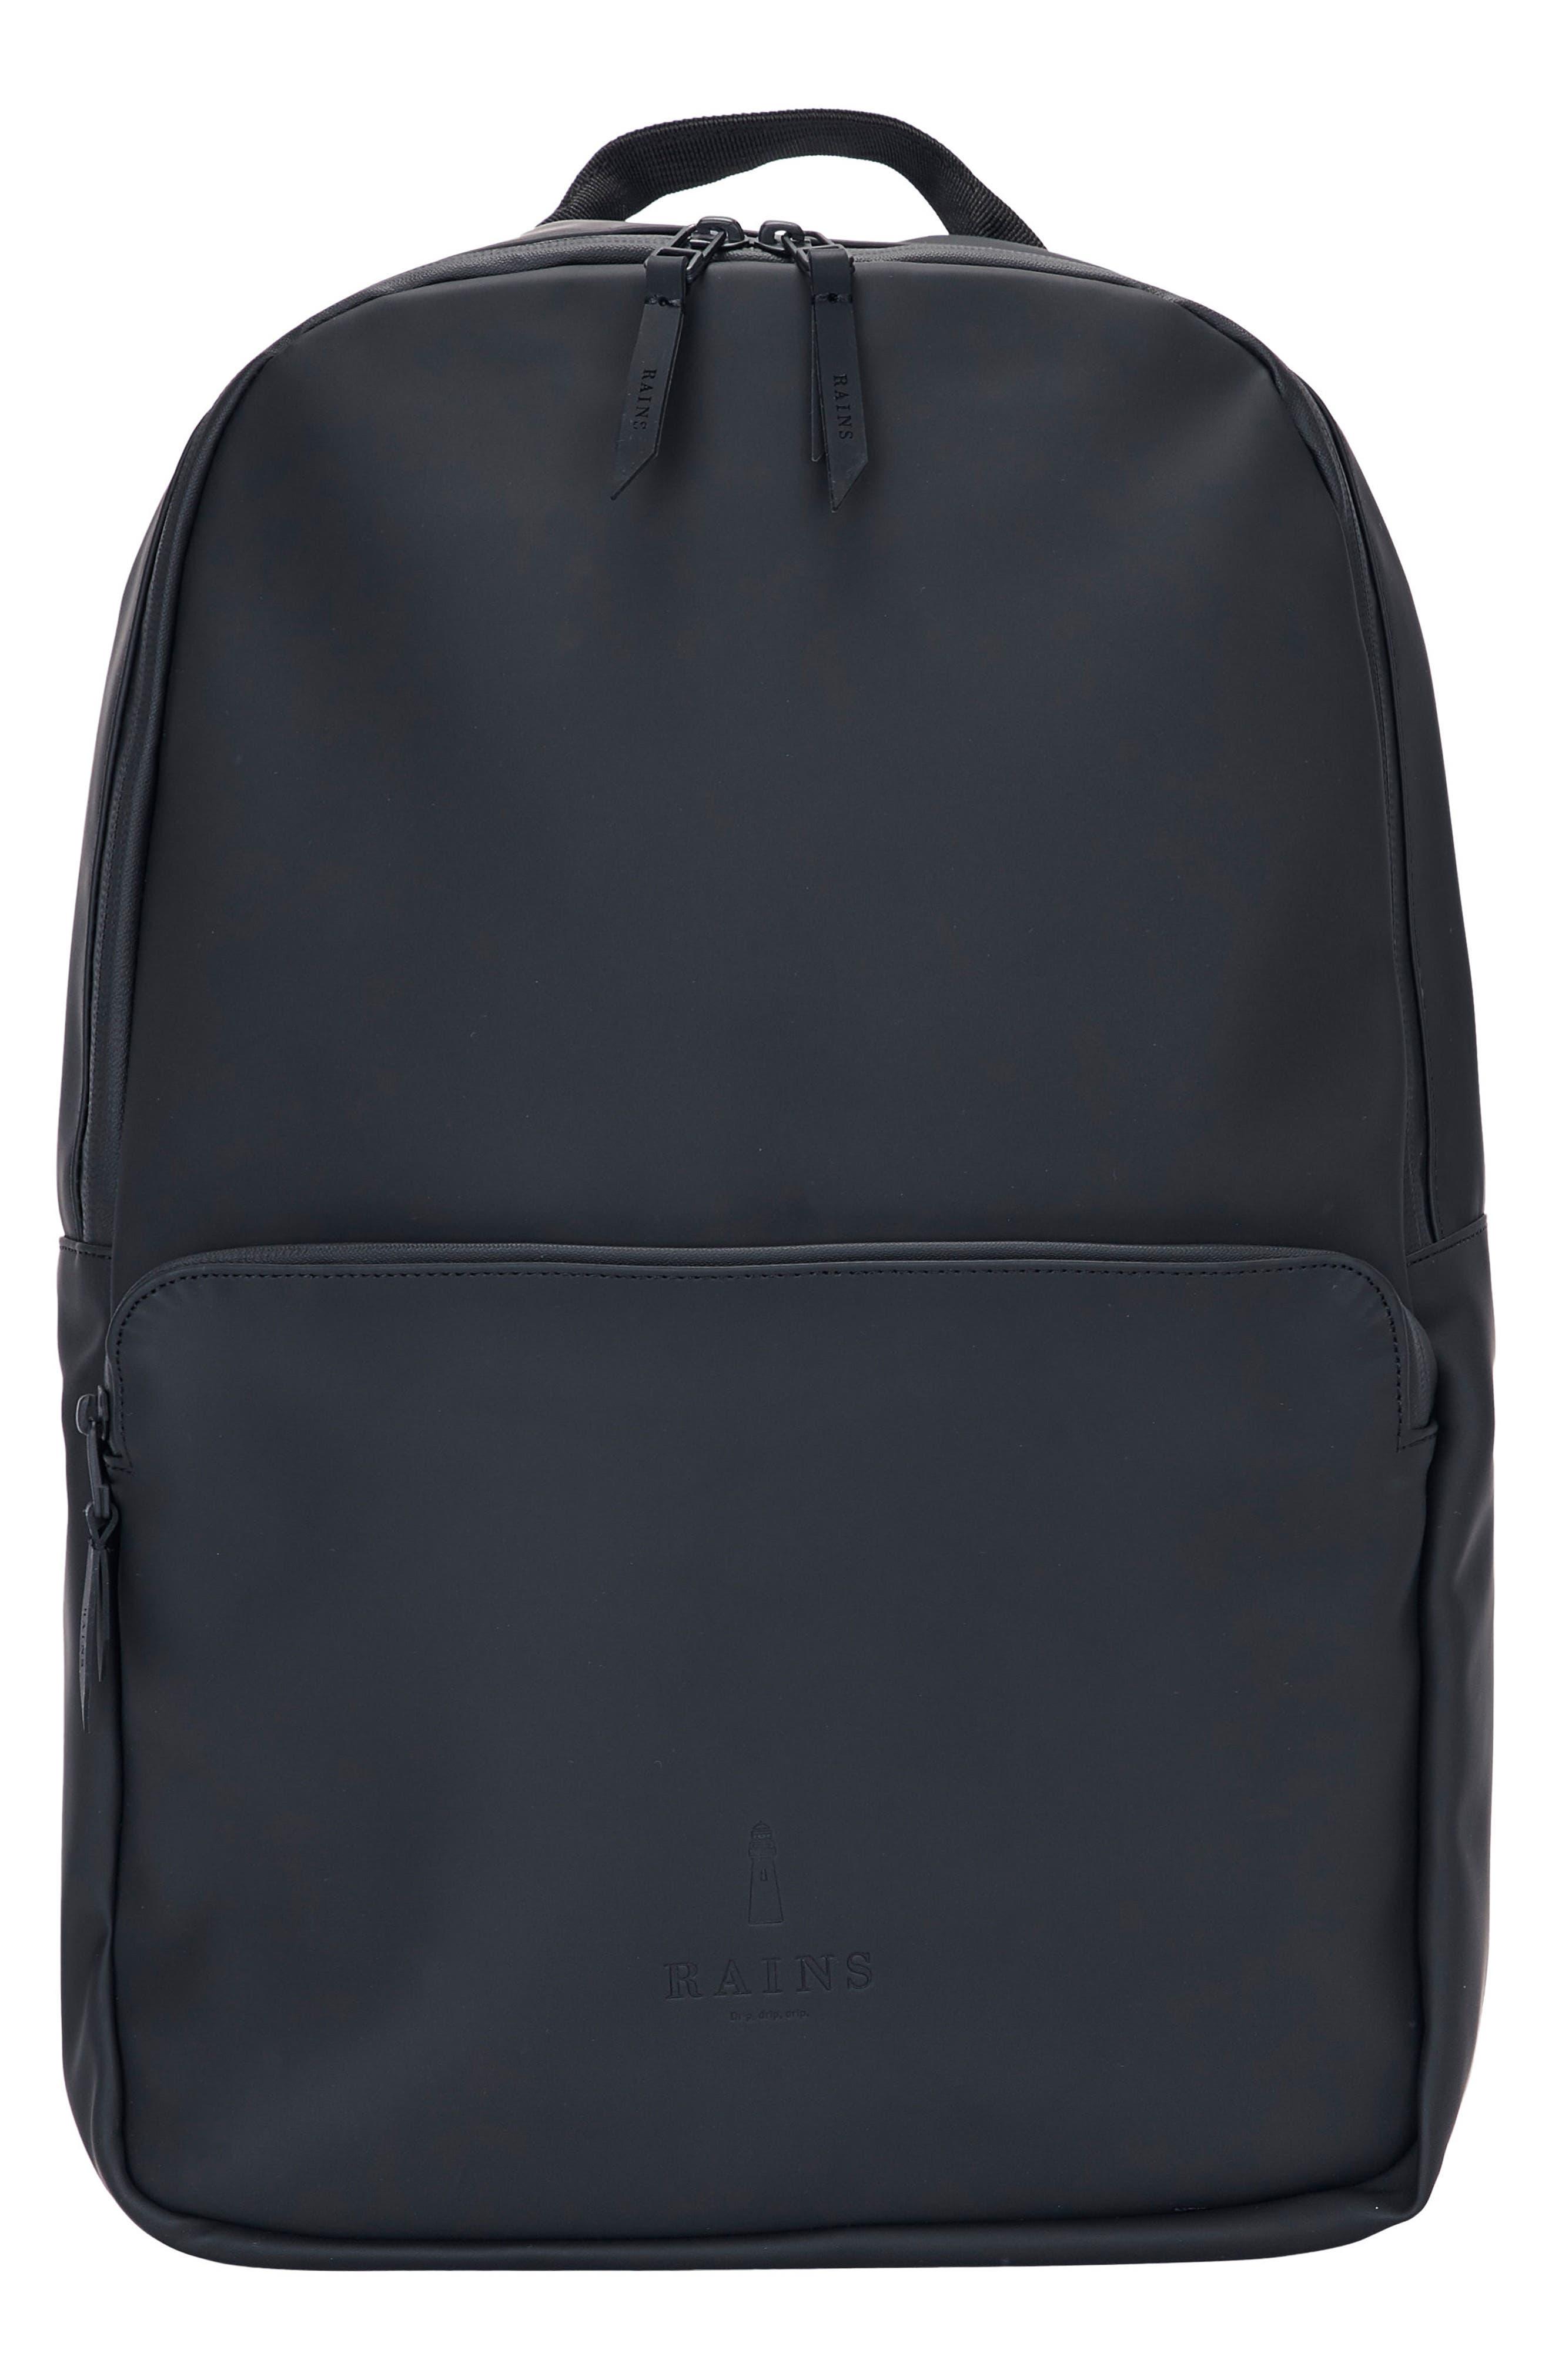 Field Backpack,                             Main thumbnail 1, color,                             Black